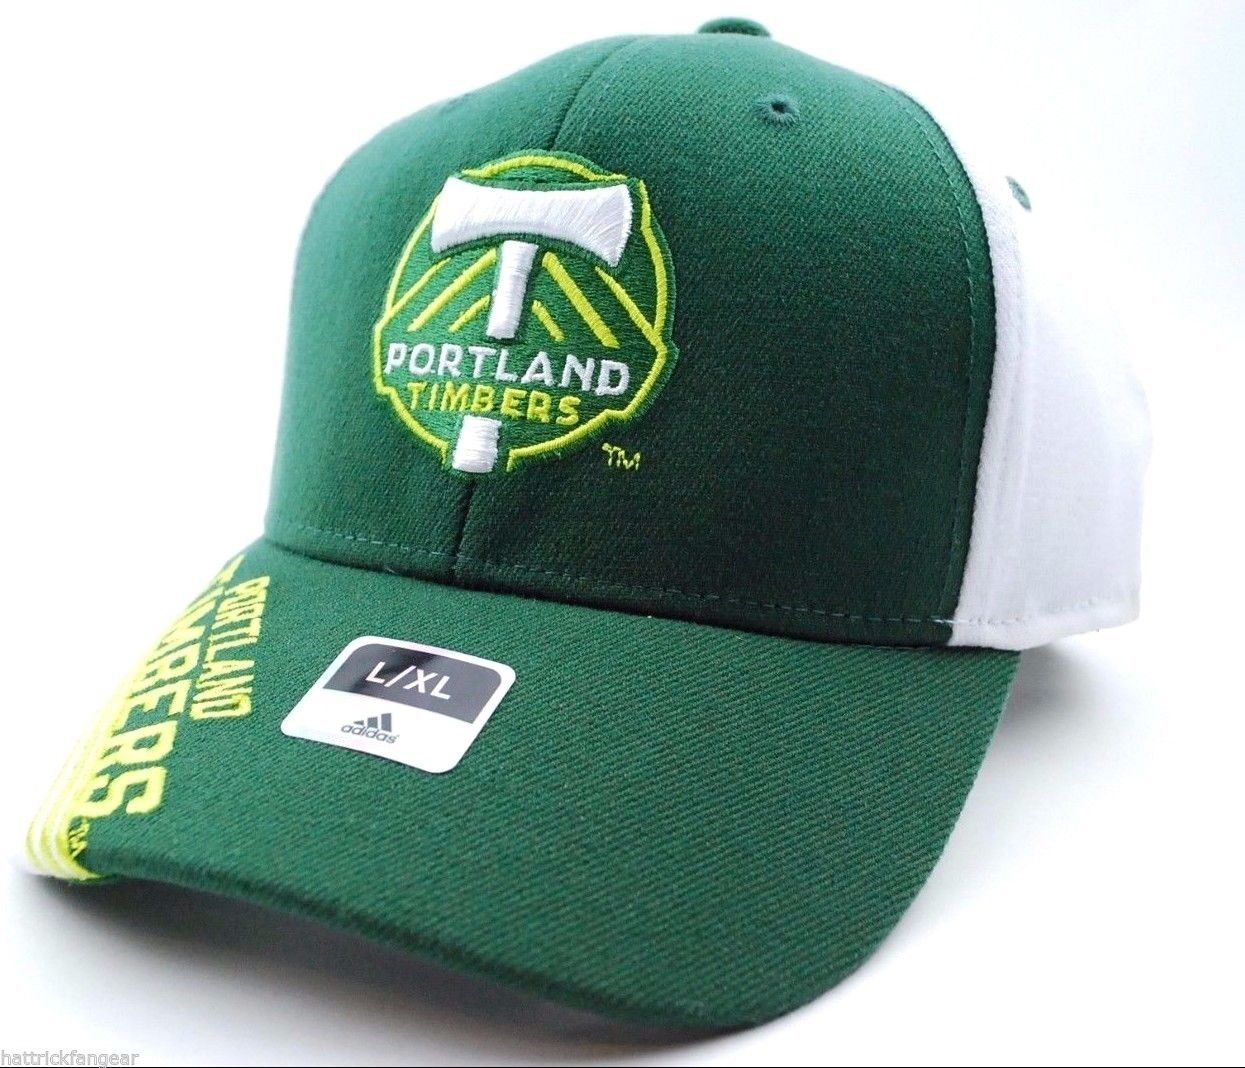 4abd9be3709fb Portland Timbers adidas M384Z MLS Team Logo and 50 similar items